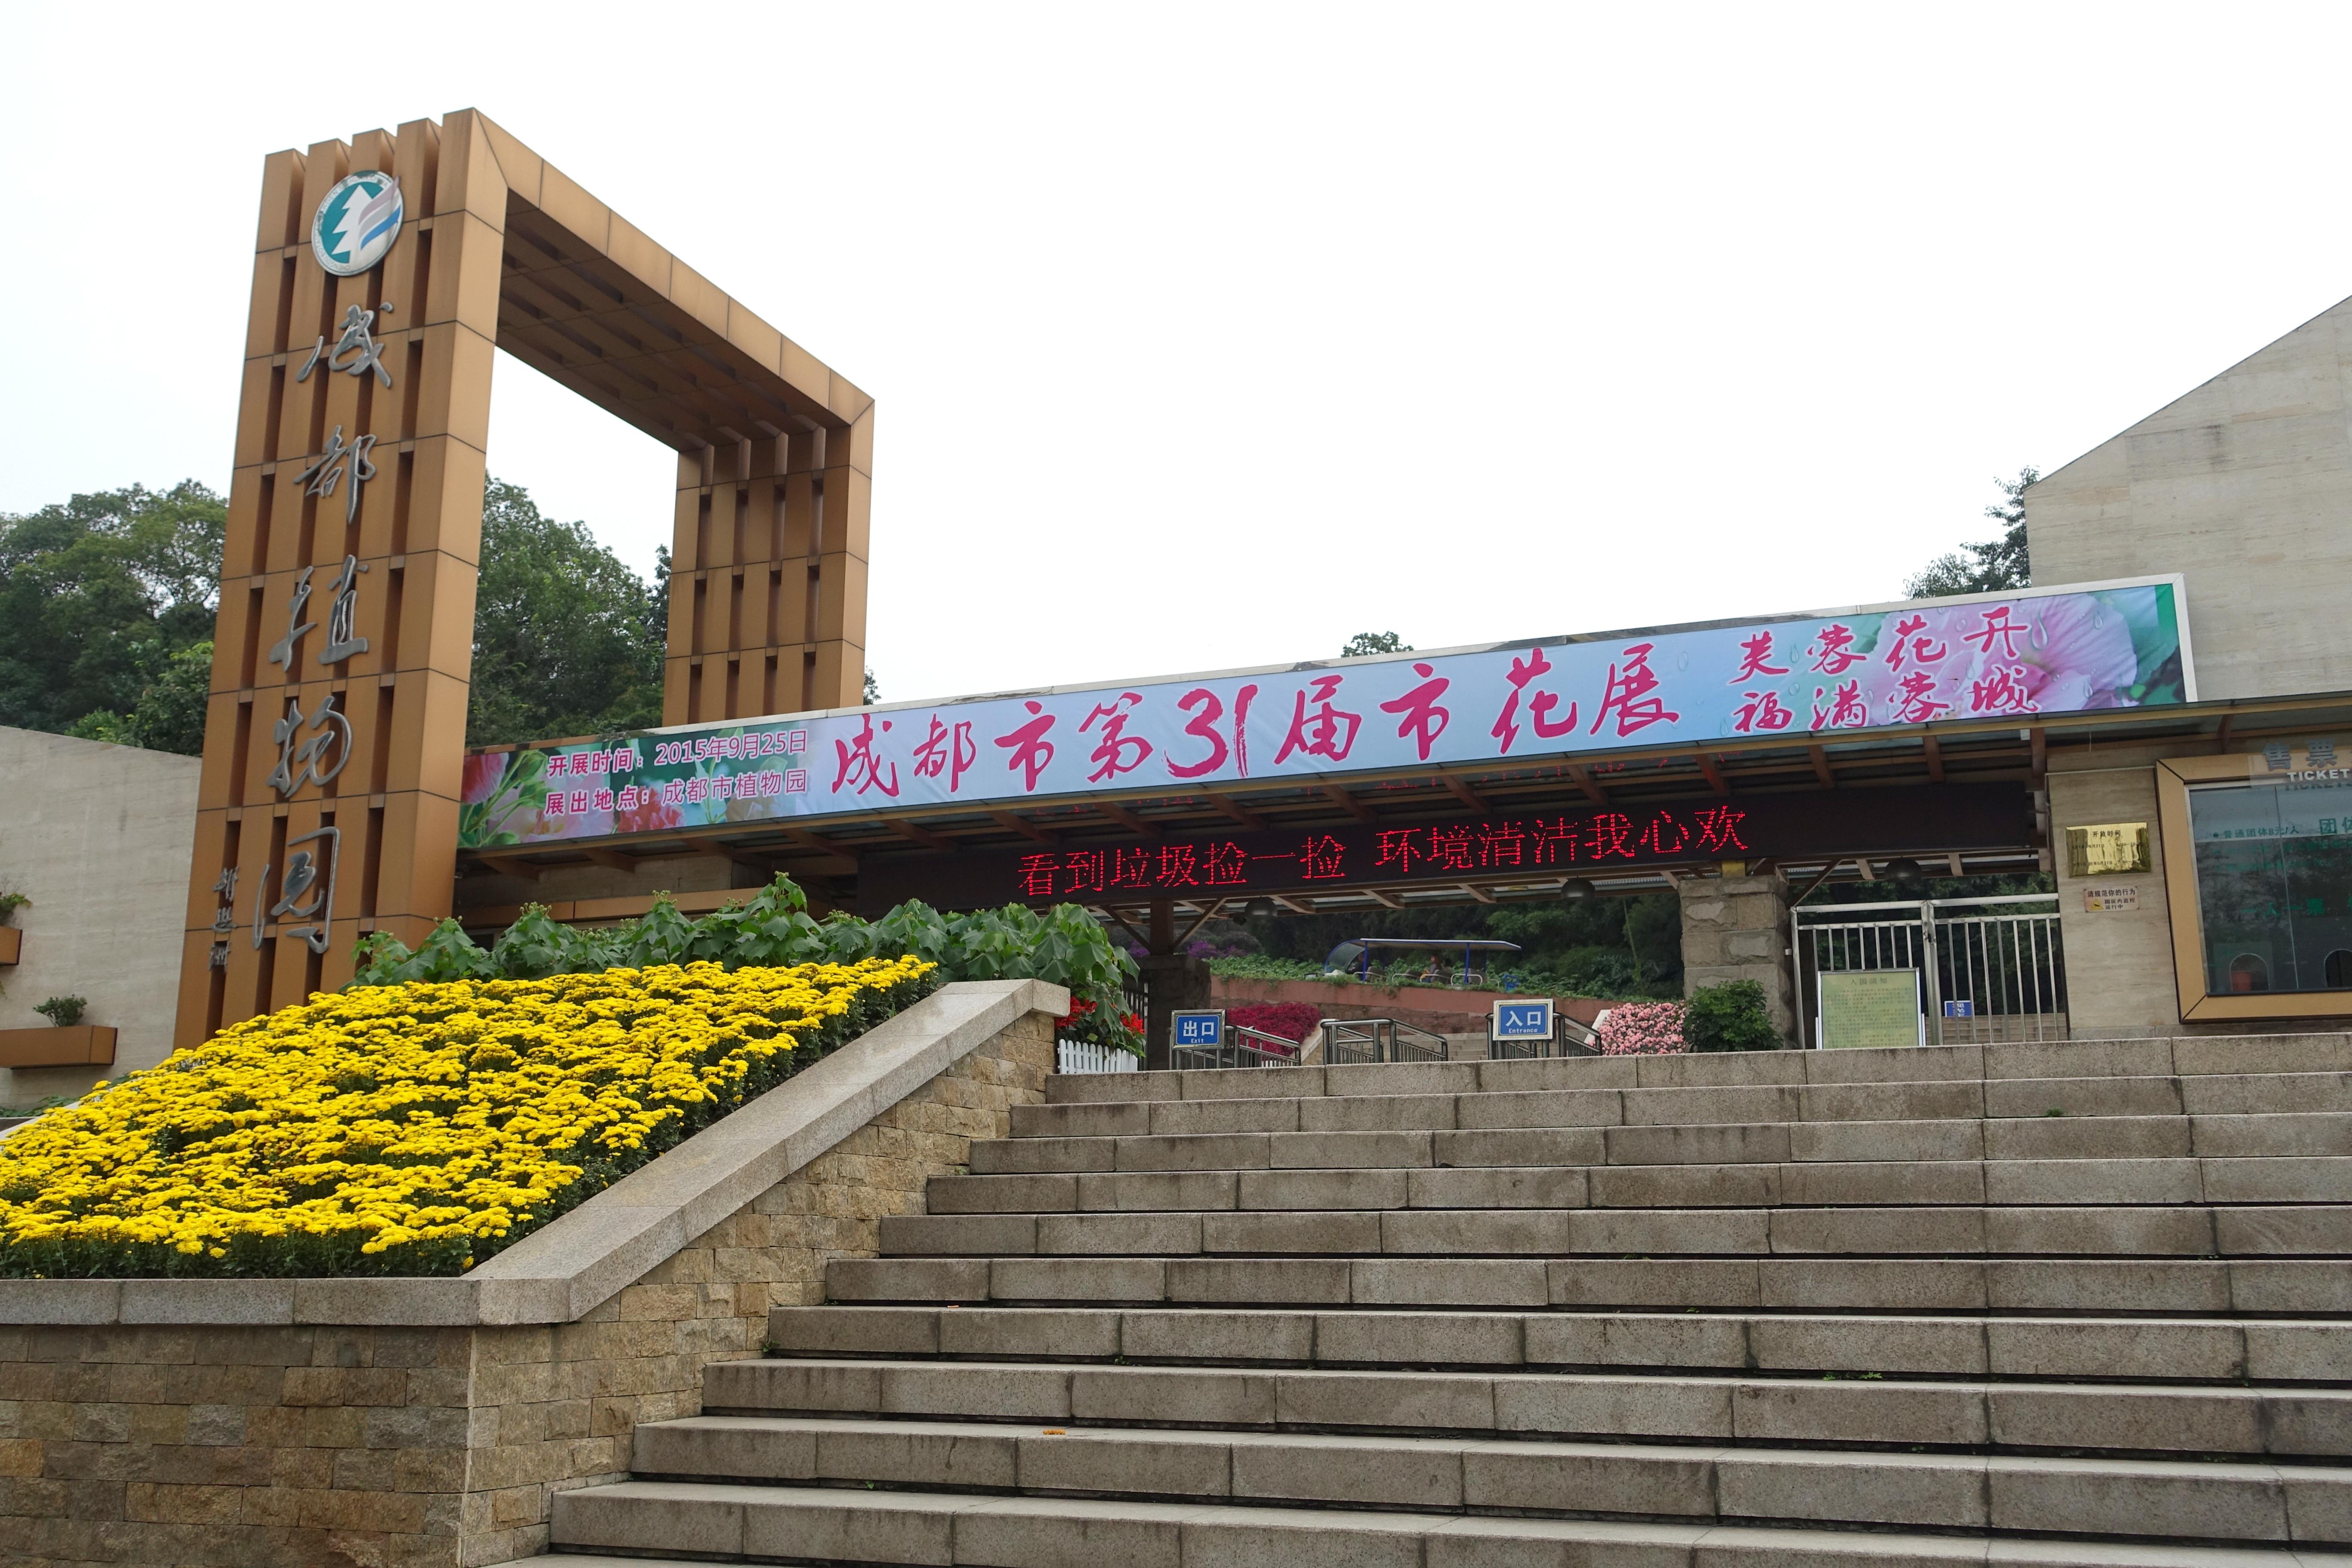 File:Entry (West Gate) - Chengdu Botanical Garden ...